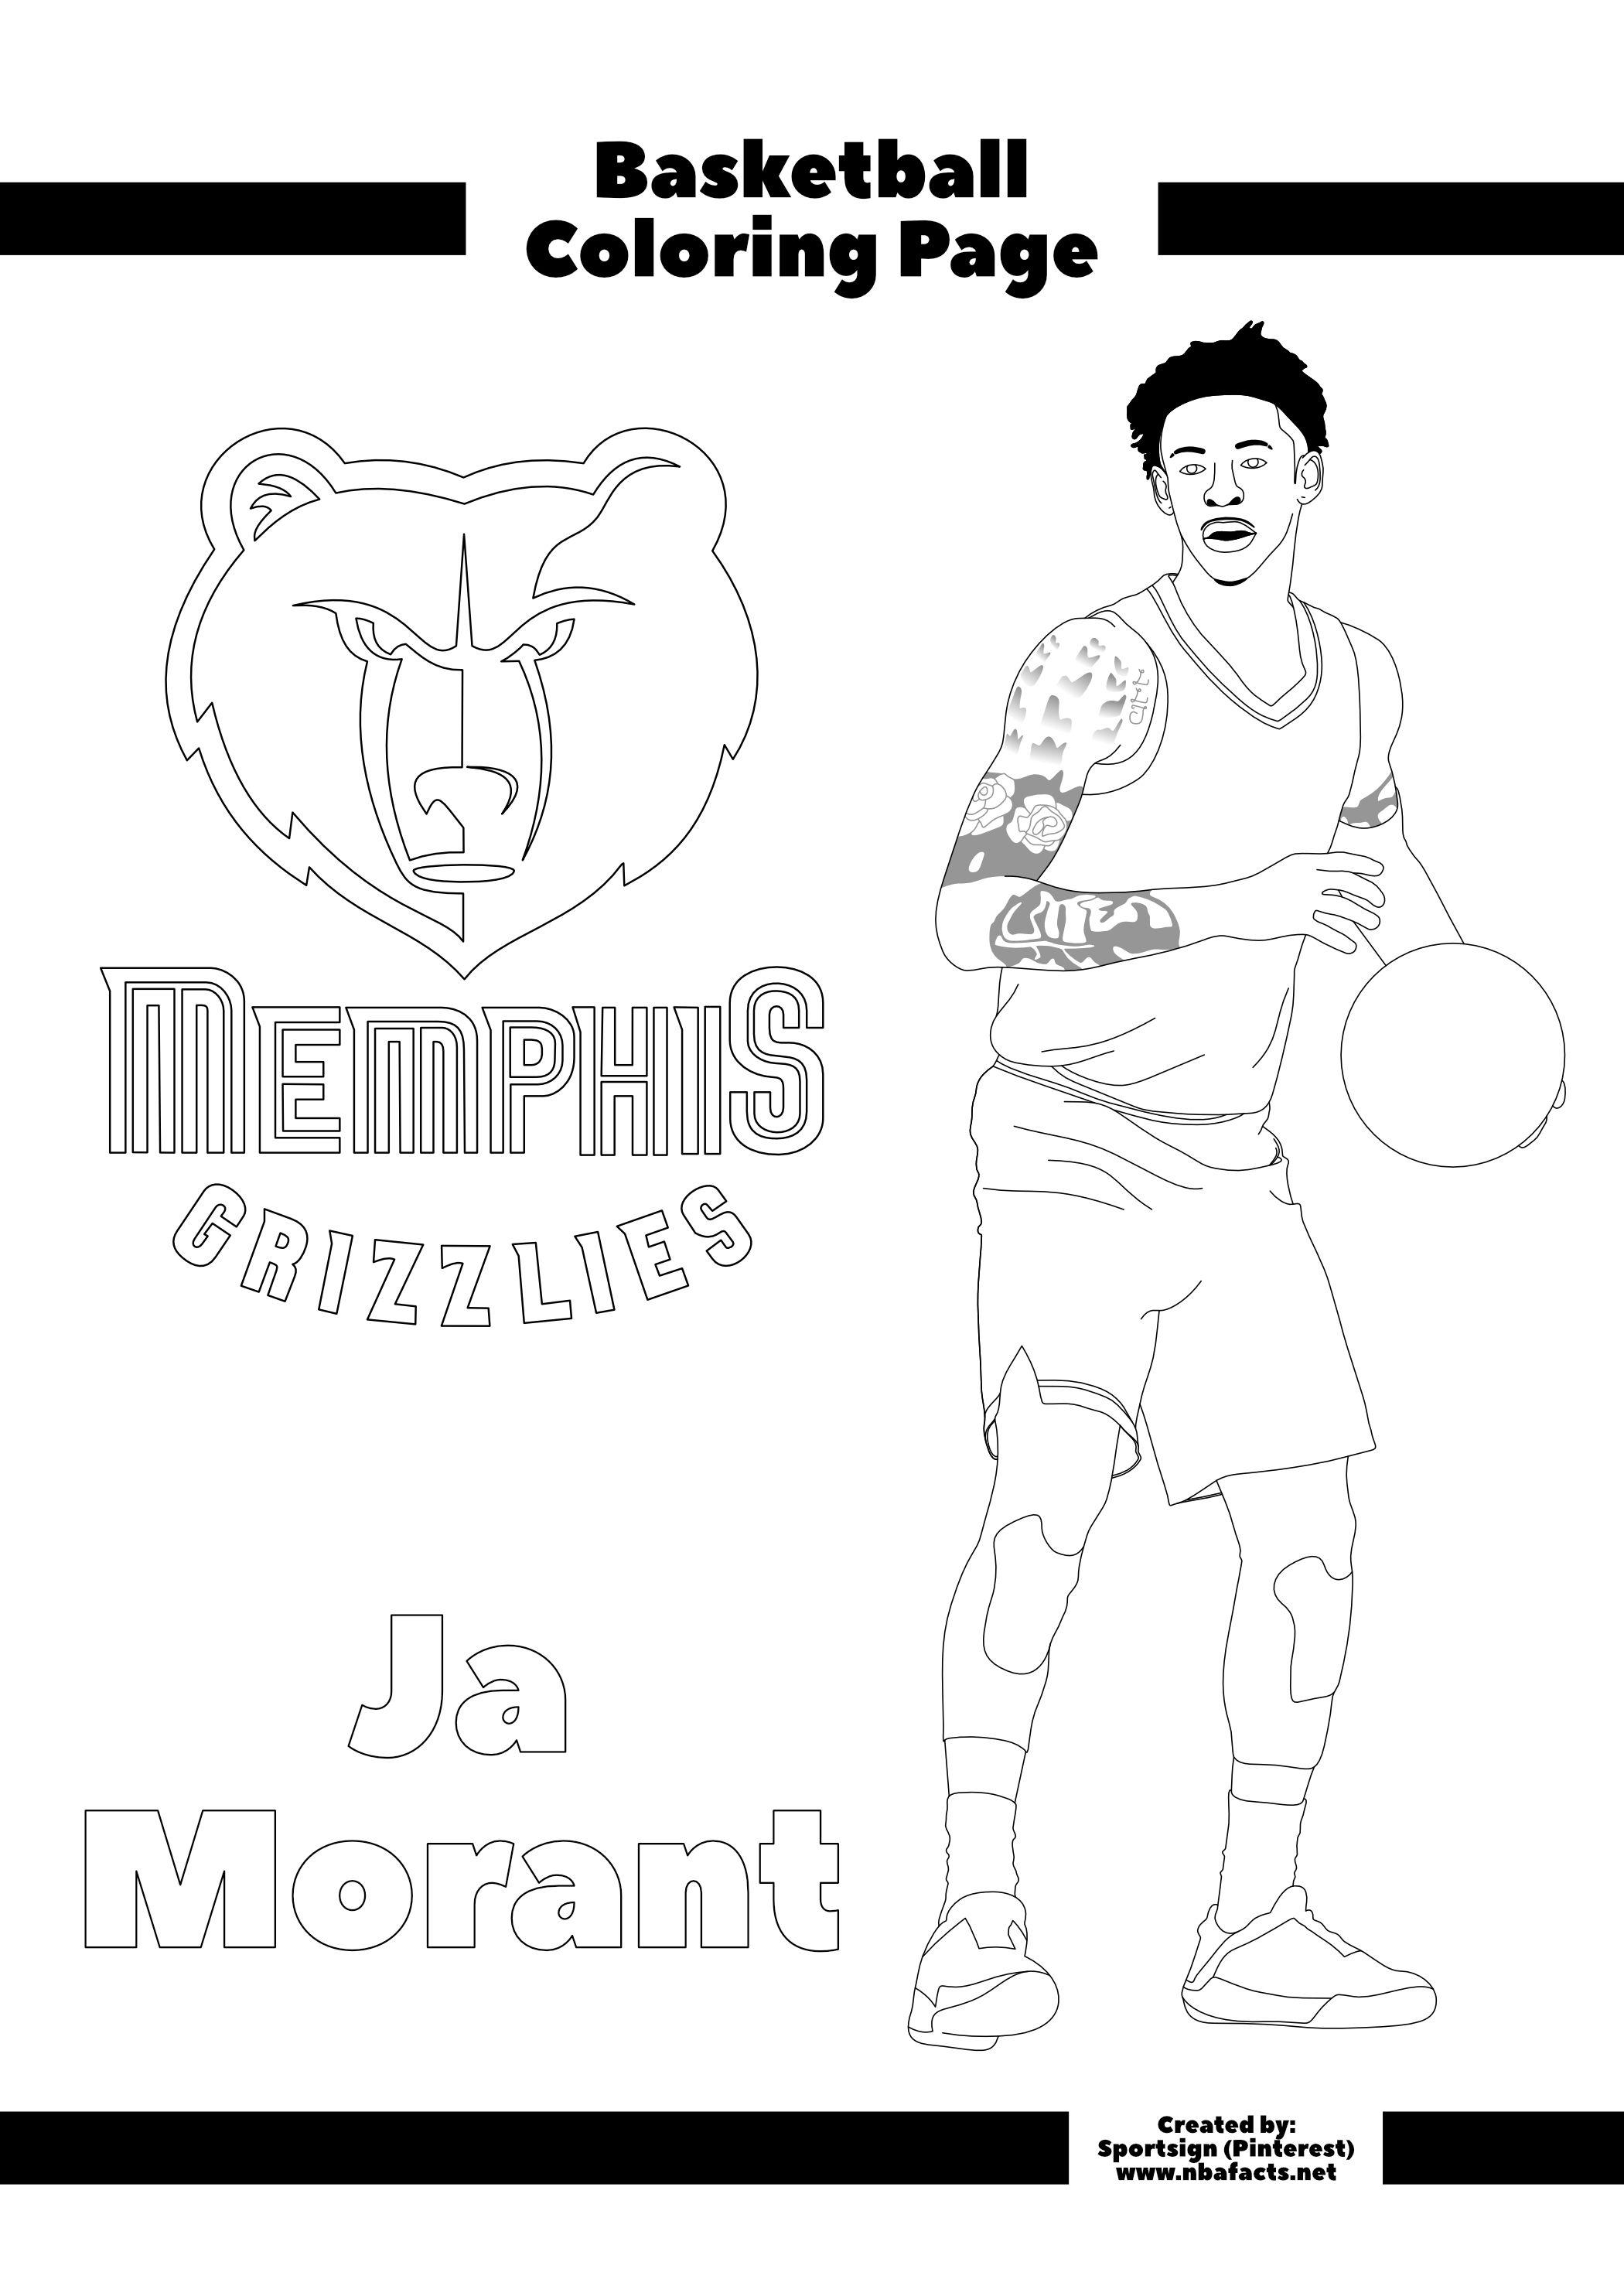 Ja Morant Free Nba Kids Coloring Sheet Coloring For Kids Coloring Sheets For Kids Coloring Sheets